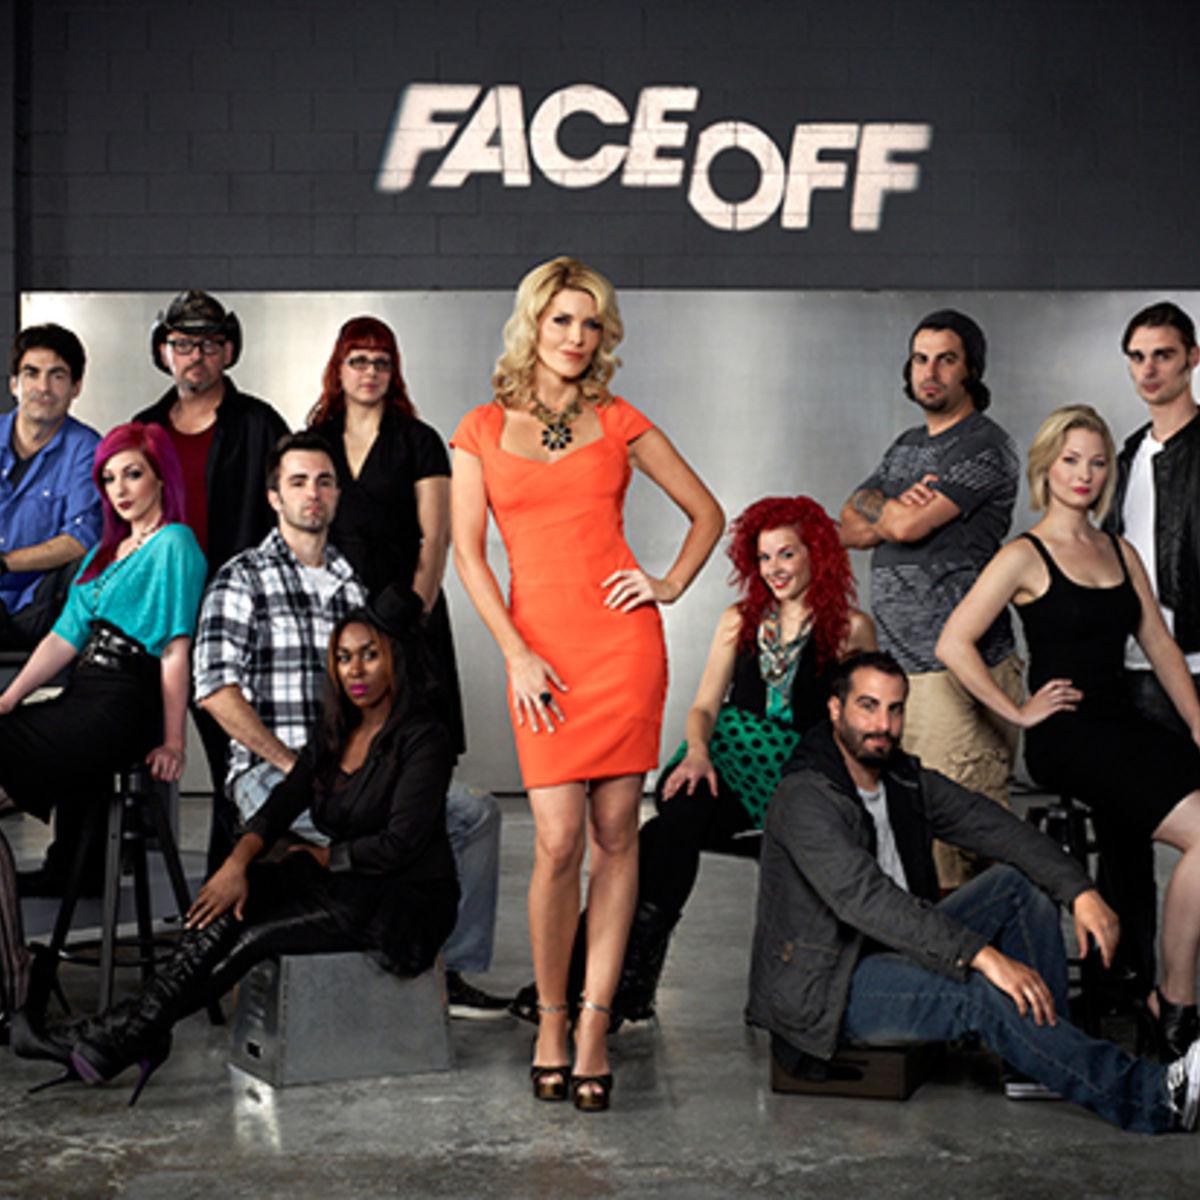 FaceOffSeason3contestants.jpg